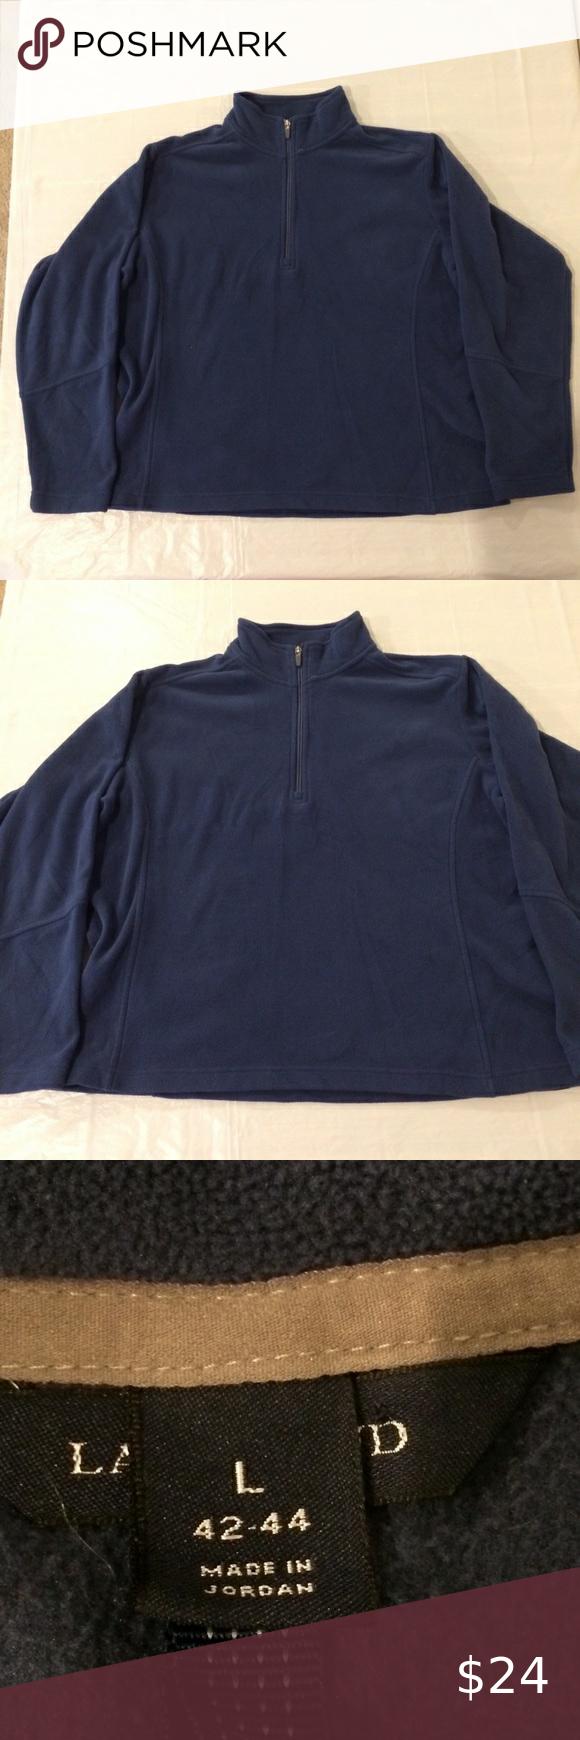 Lands End Polartec Fleece Sweatshirt Jacket Mens L Measurements In Photos Lands End Jackets Coats Boho Leather Jacket Wool Sweaters Womens Pullover Men [ 1740 x 580 Pixel ]